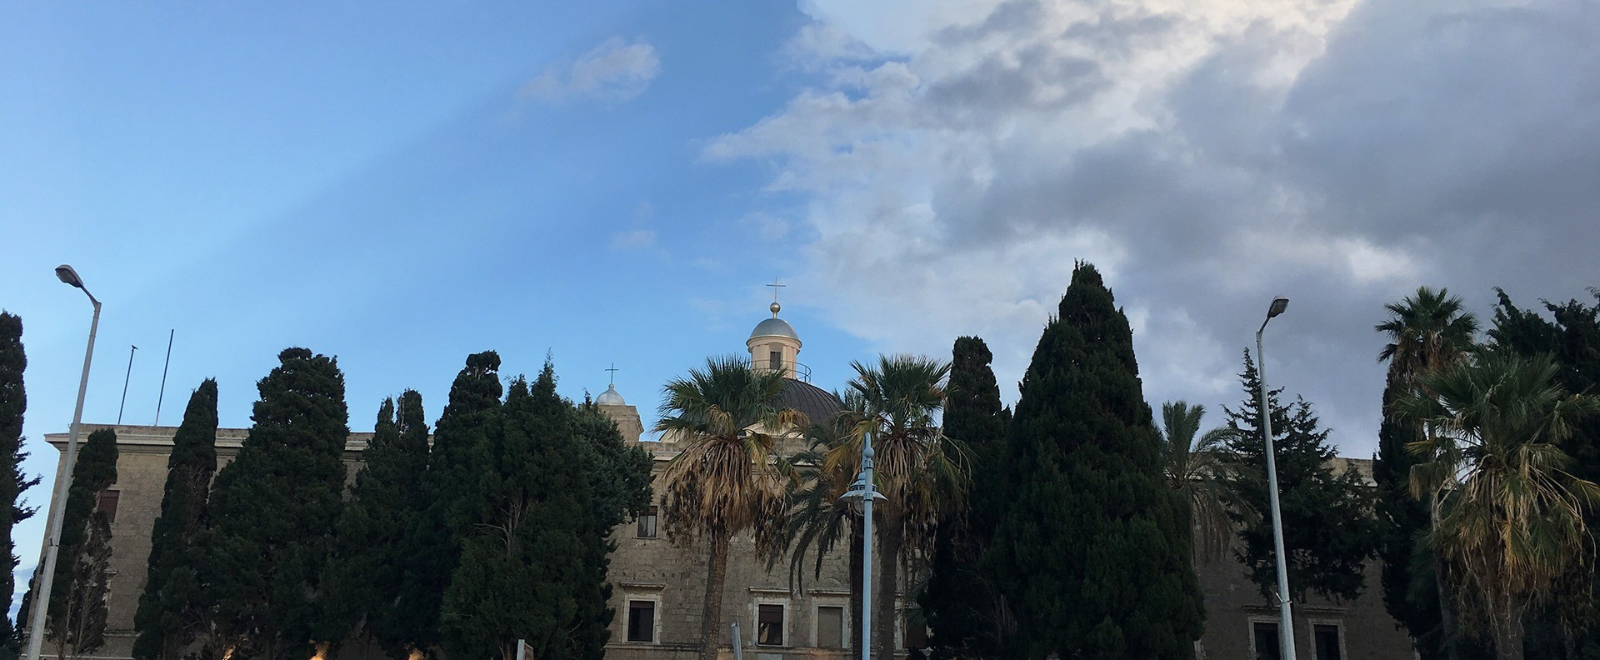 Stella Maris Monastery and Church